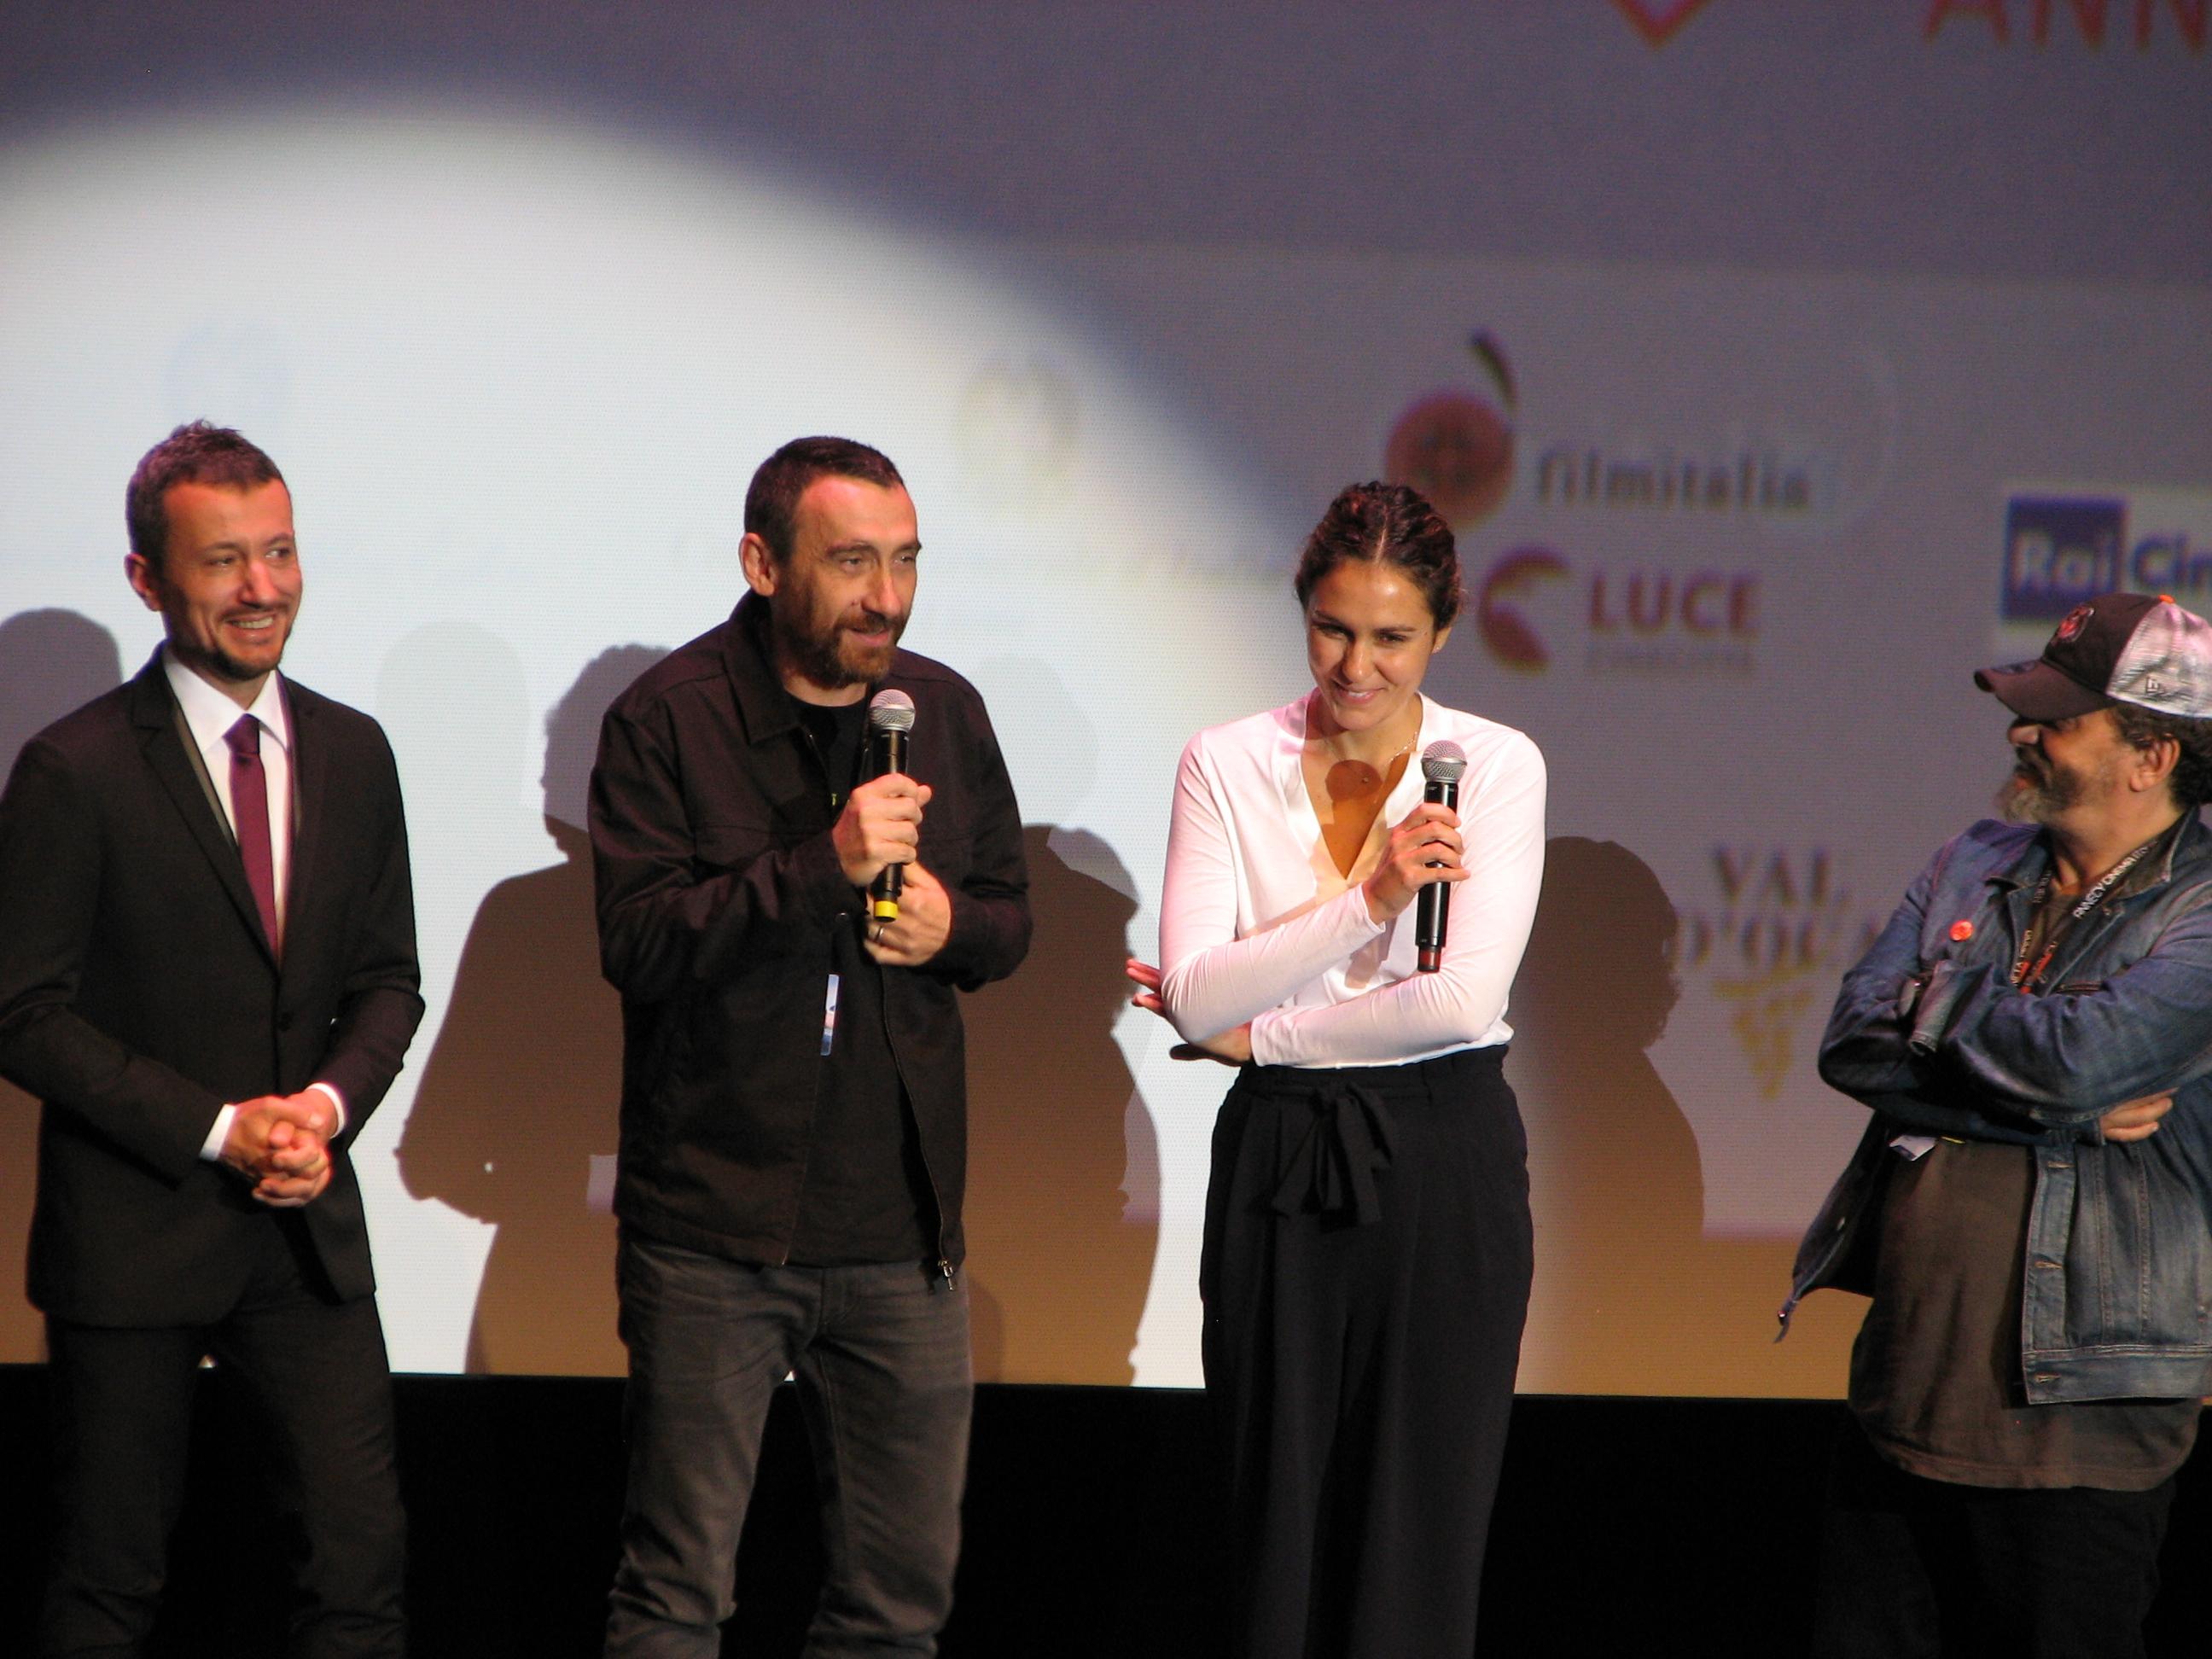 FRancesco Giai Via à gauche, Antonio et Marco Manetti